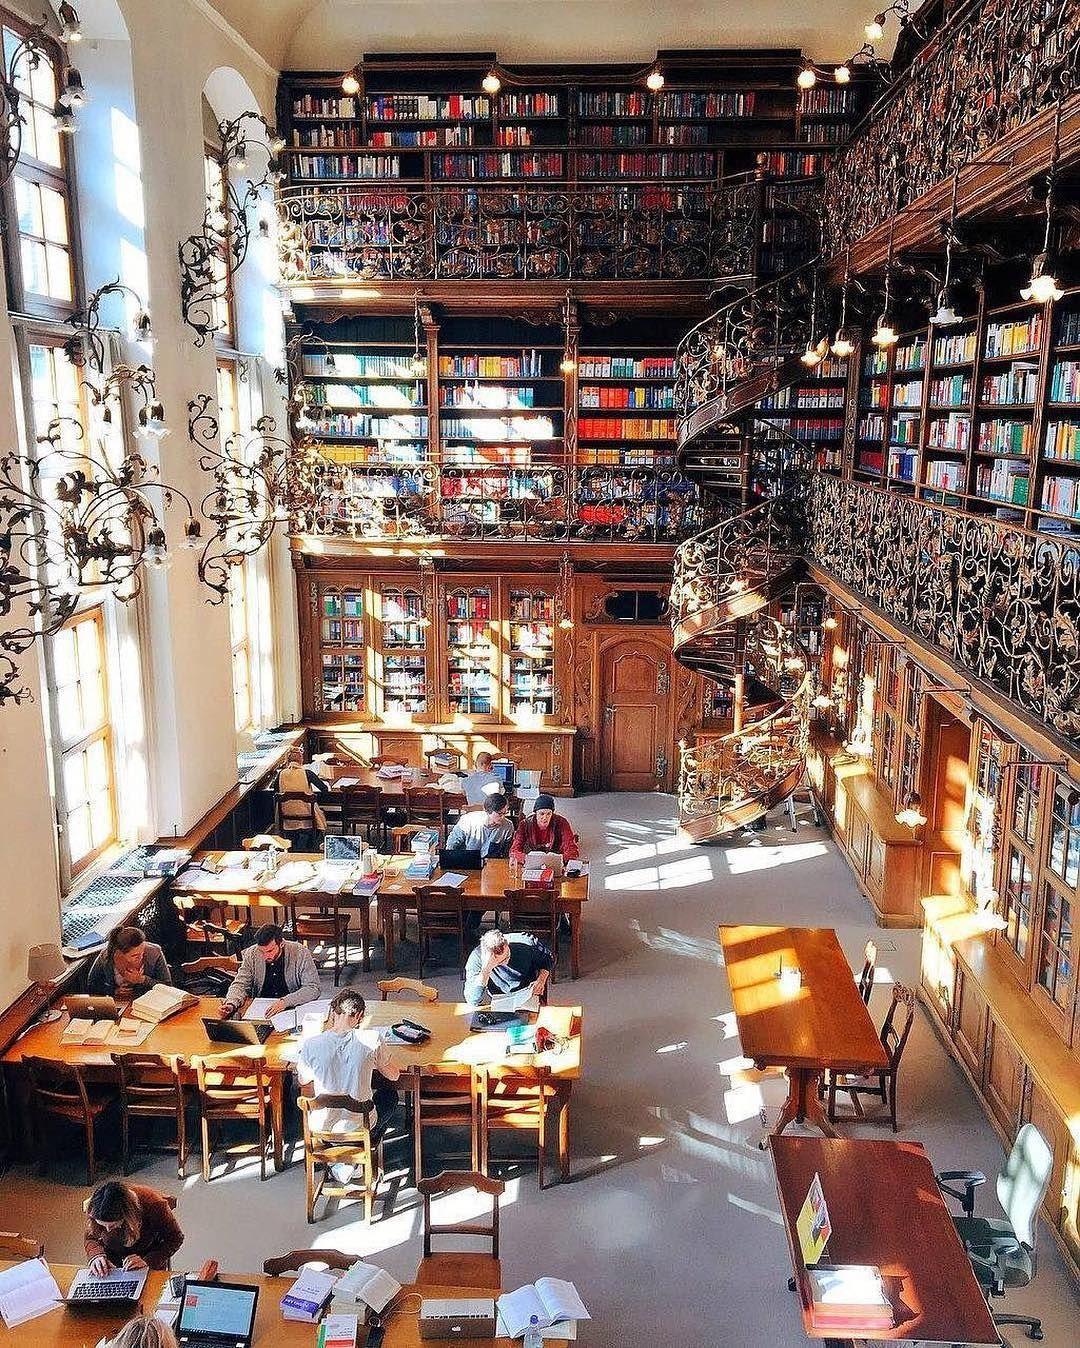 Stunning architecture of juristic library munich germany for Interior design munich